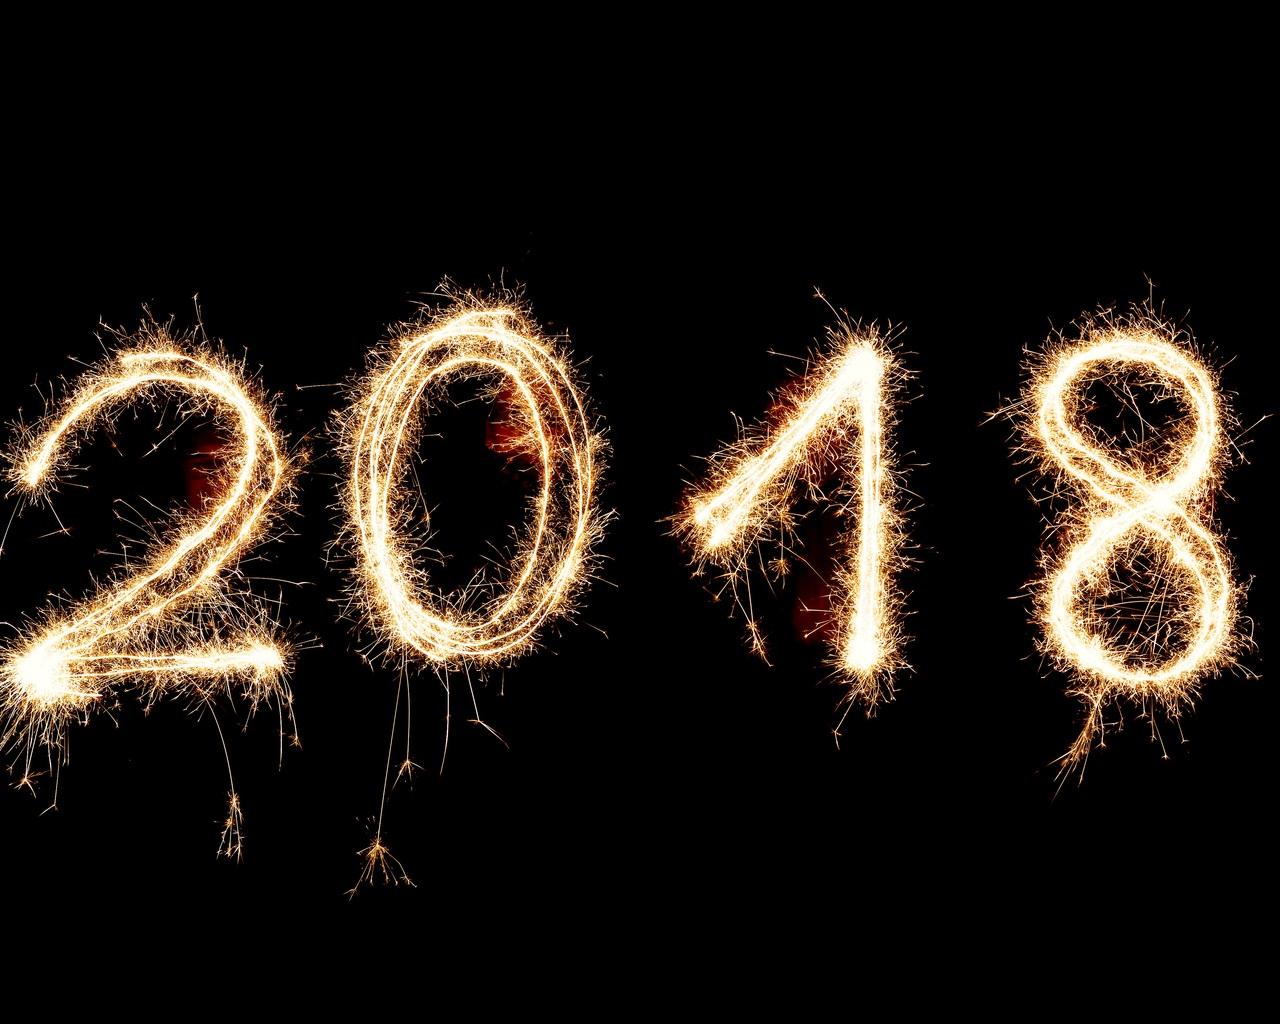 1280x1024 Happy New Year 2018 1280x1024 Resolution HD 4k